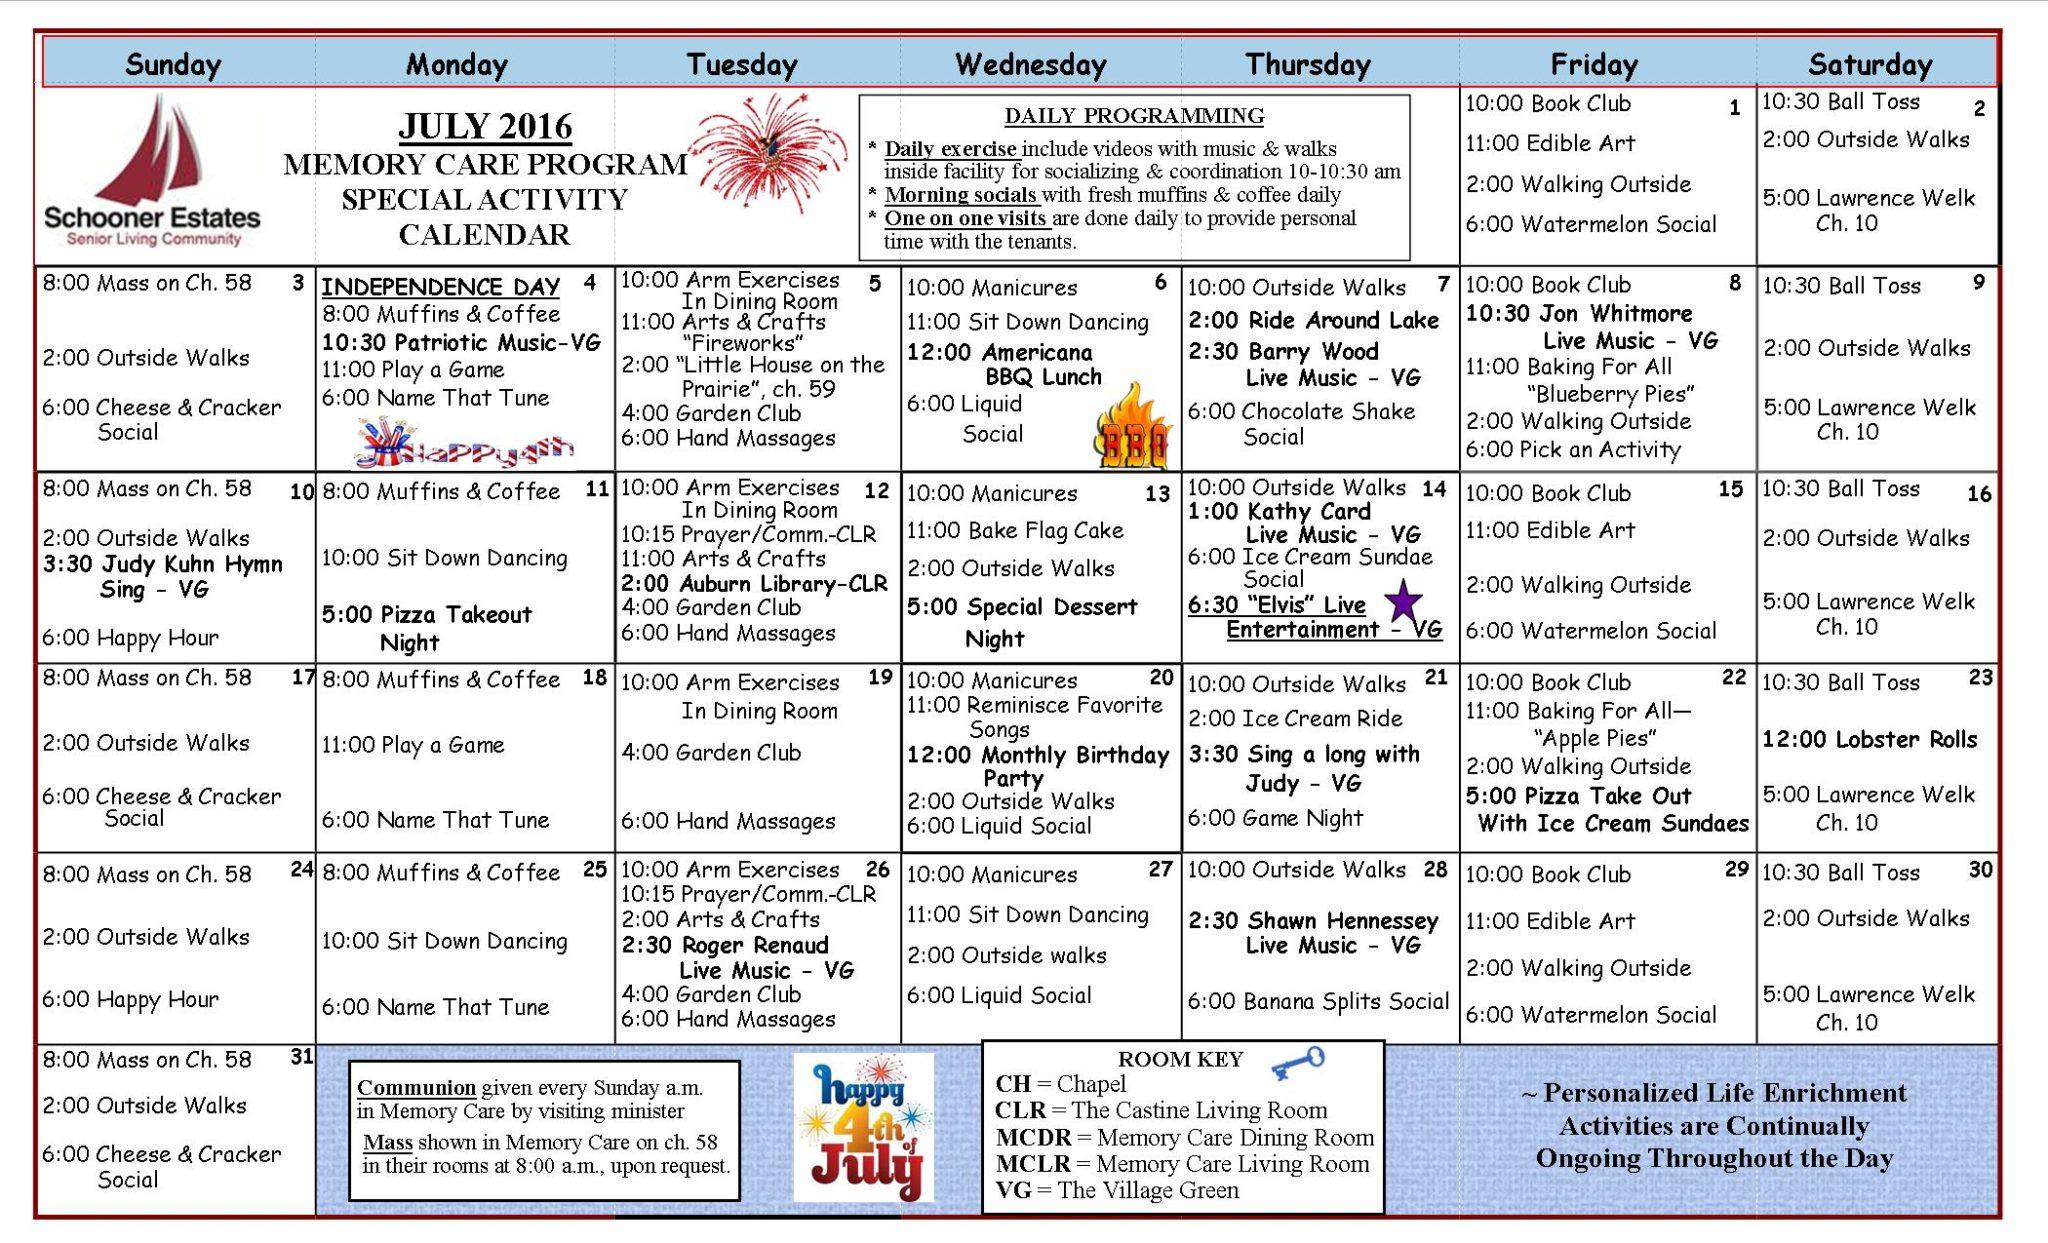 July 2016 Memory Care Calendar